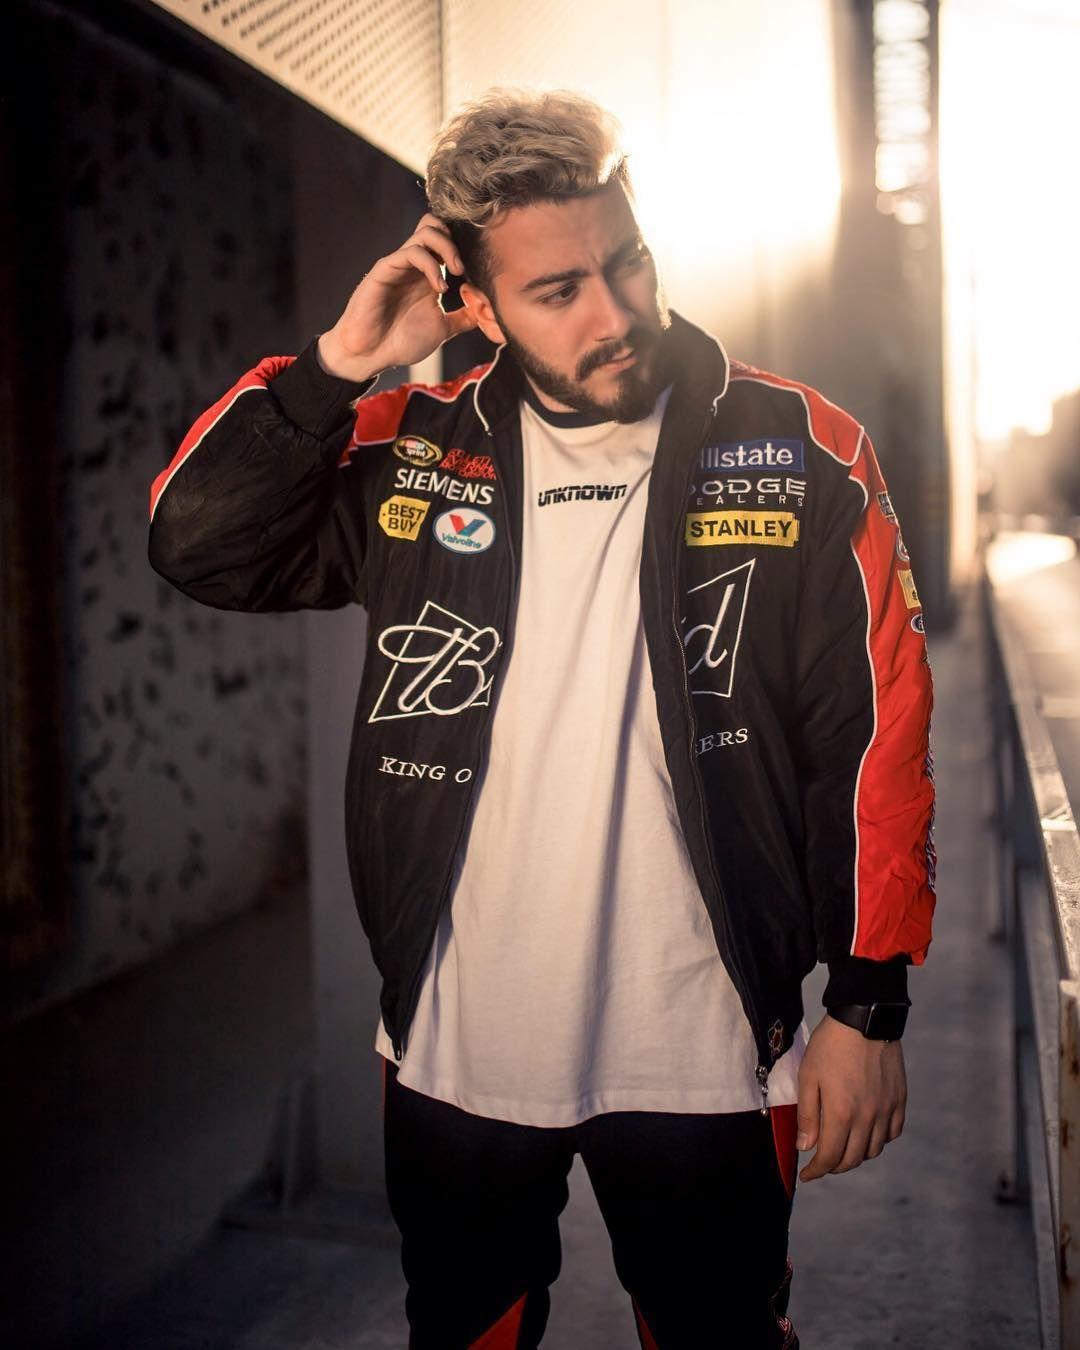 Bos Yapan Birini Gorunce Ben Motorcycle Jacket Varsity Jacket Bomber Jacket